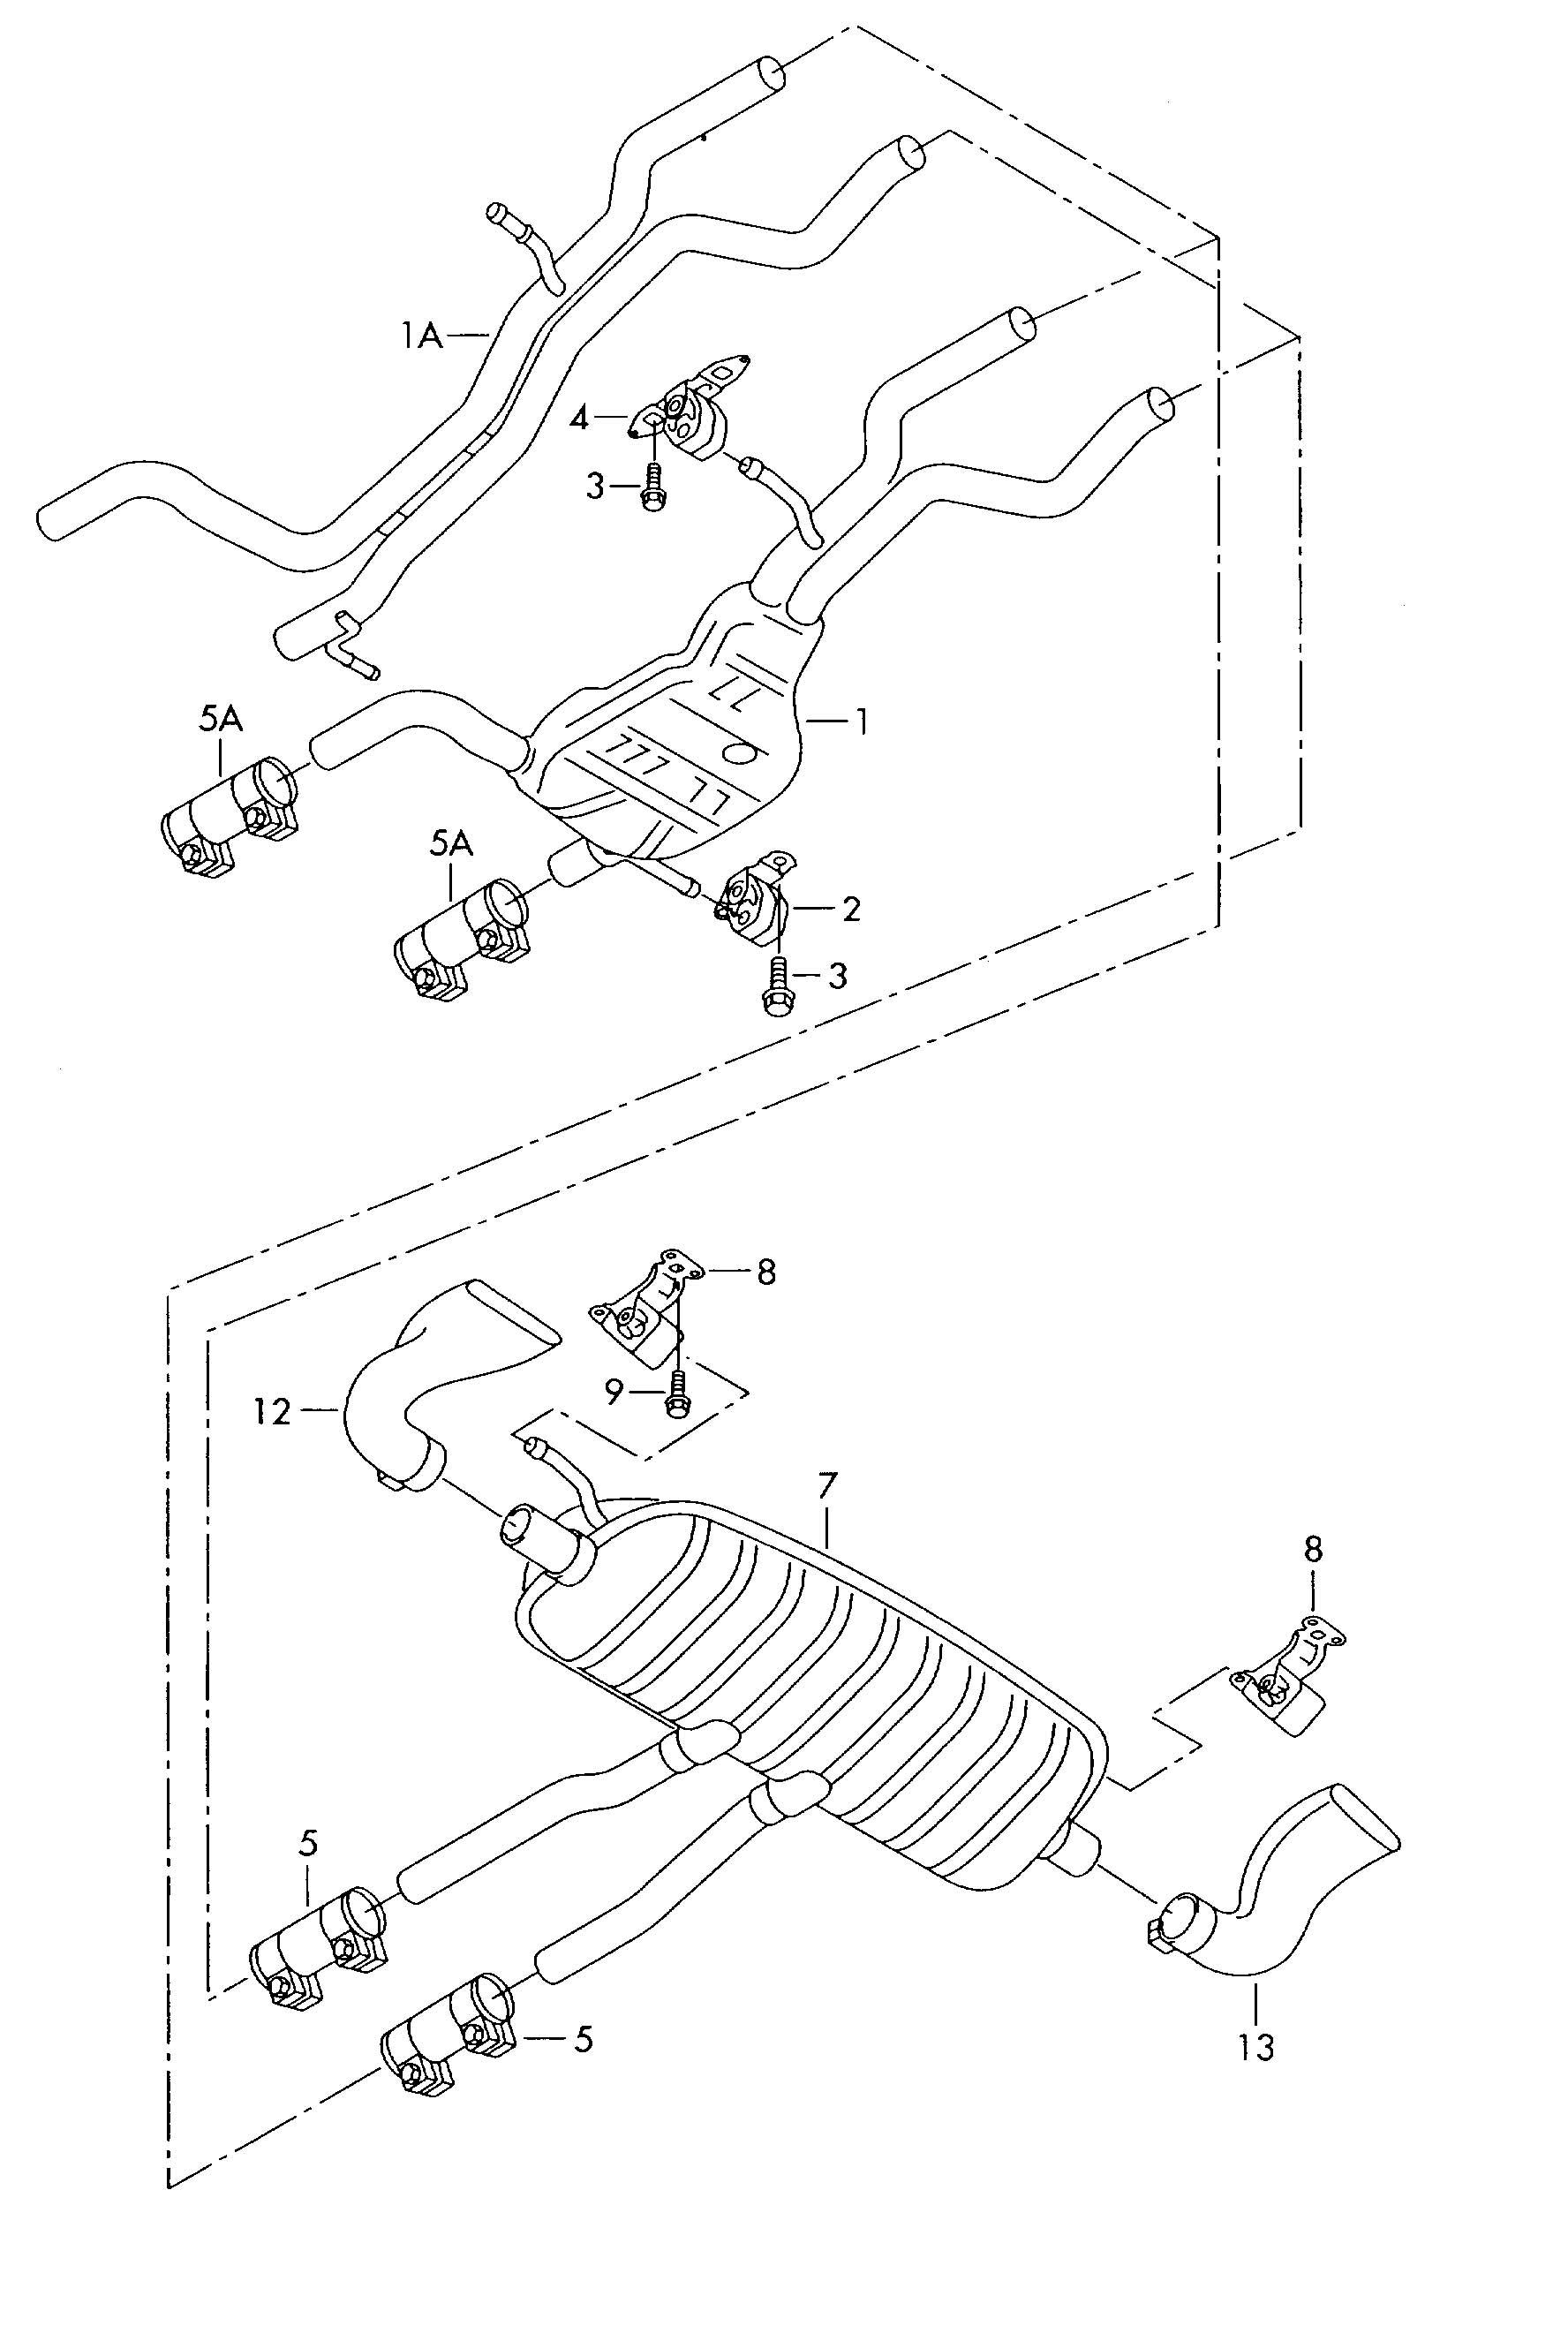 Volkswagen Touareg 3.6L 6 Cylinder Dual clamp. DUAL CLIP